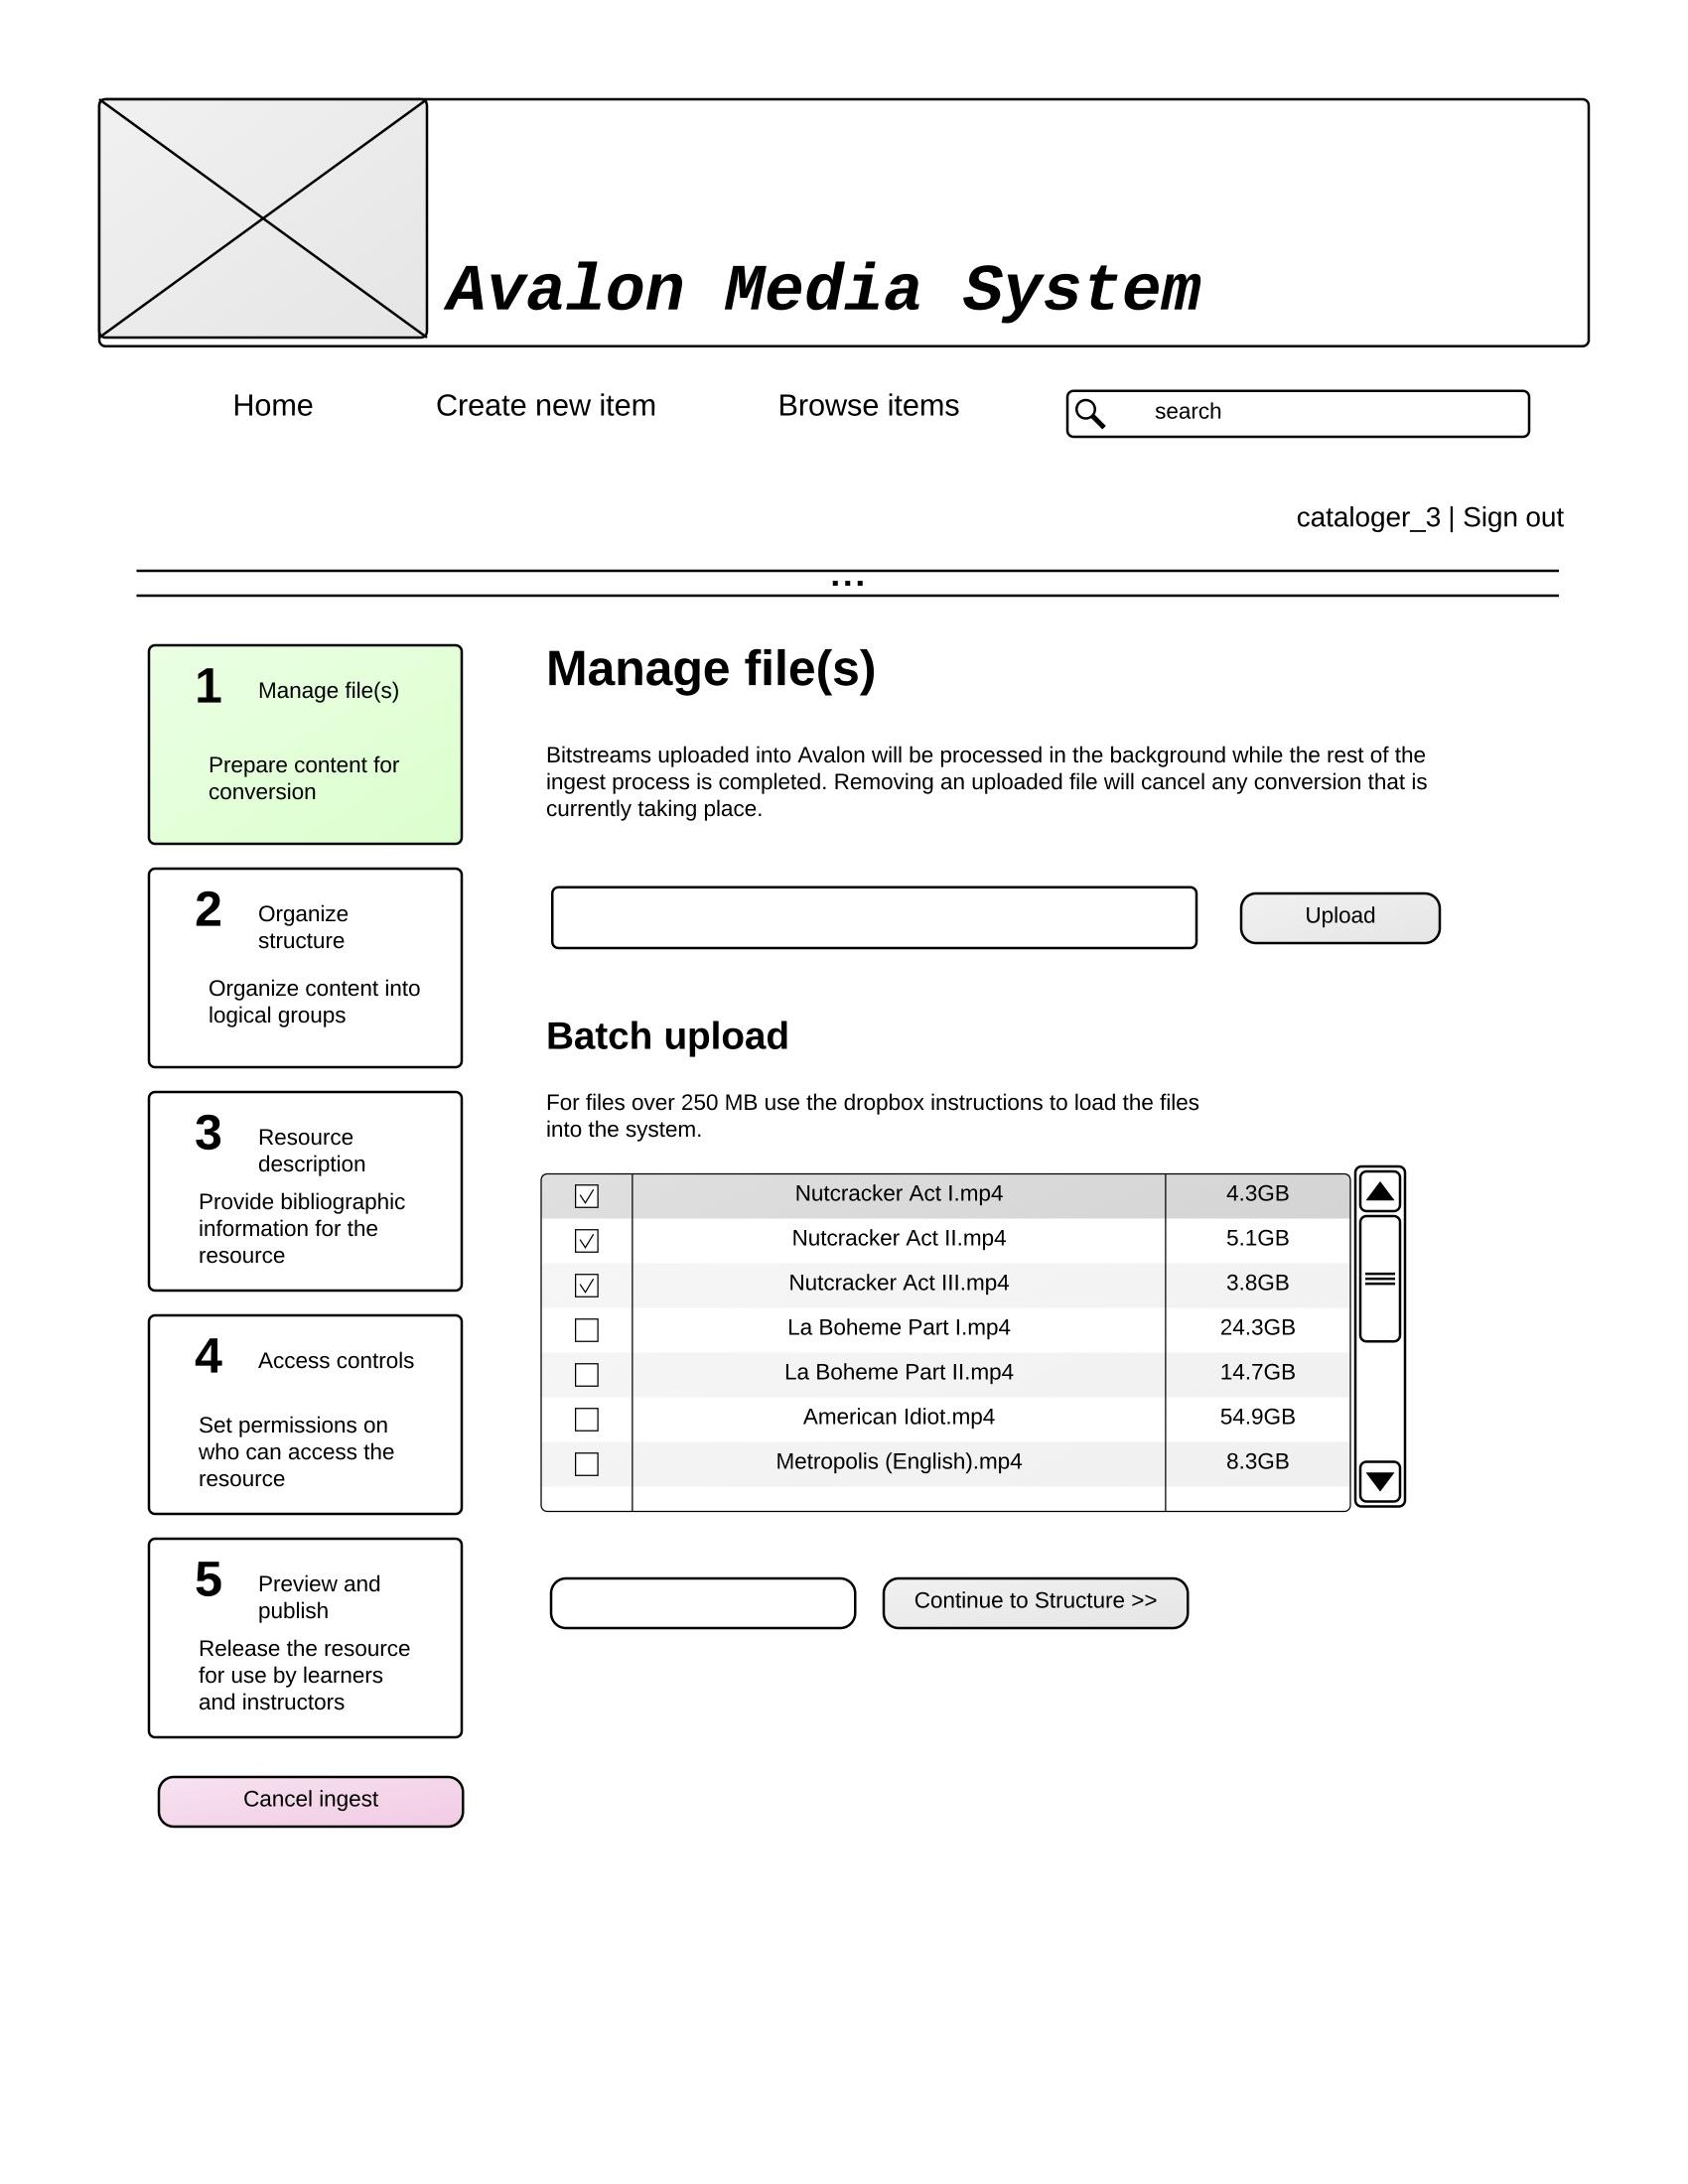 Avalon Ingest workflow (Cover Image).jpg